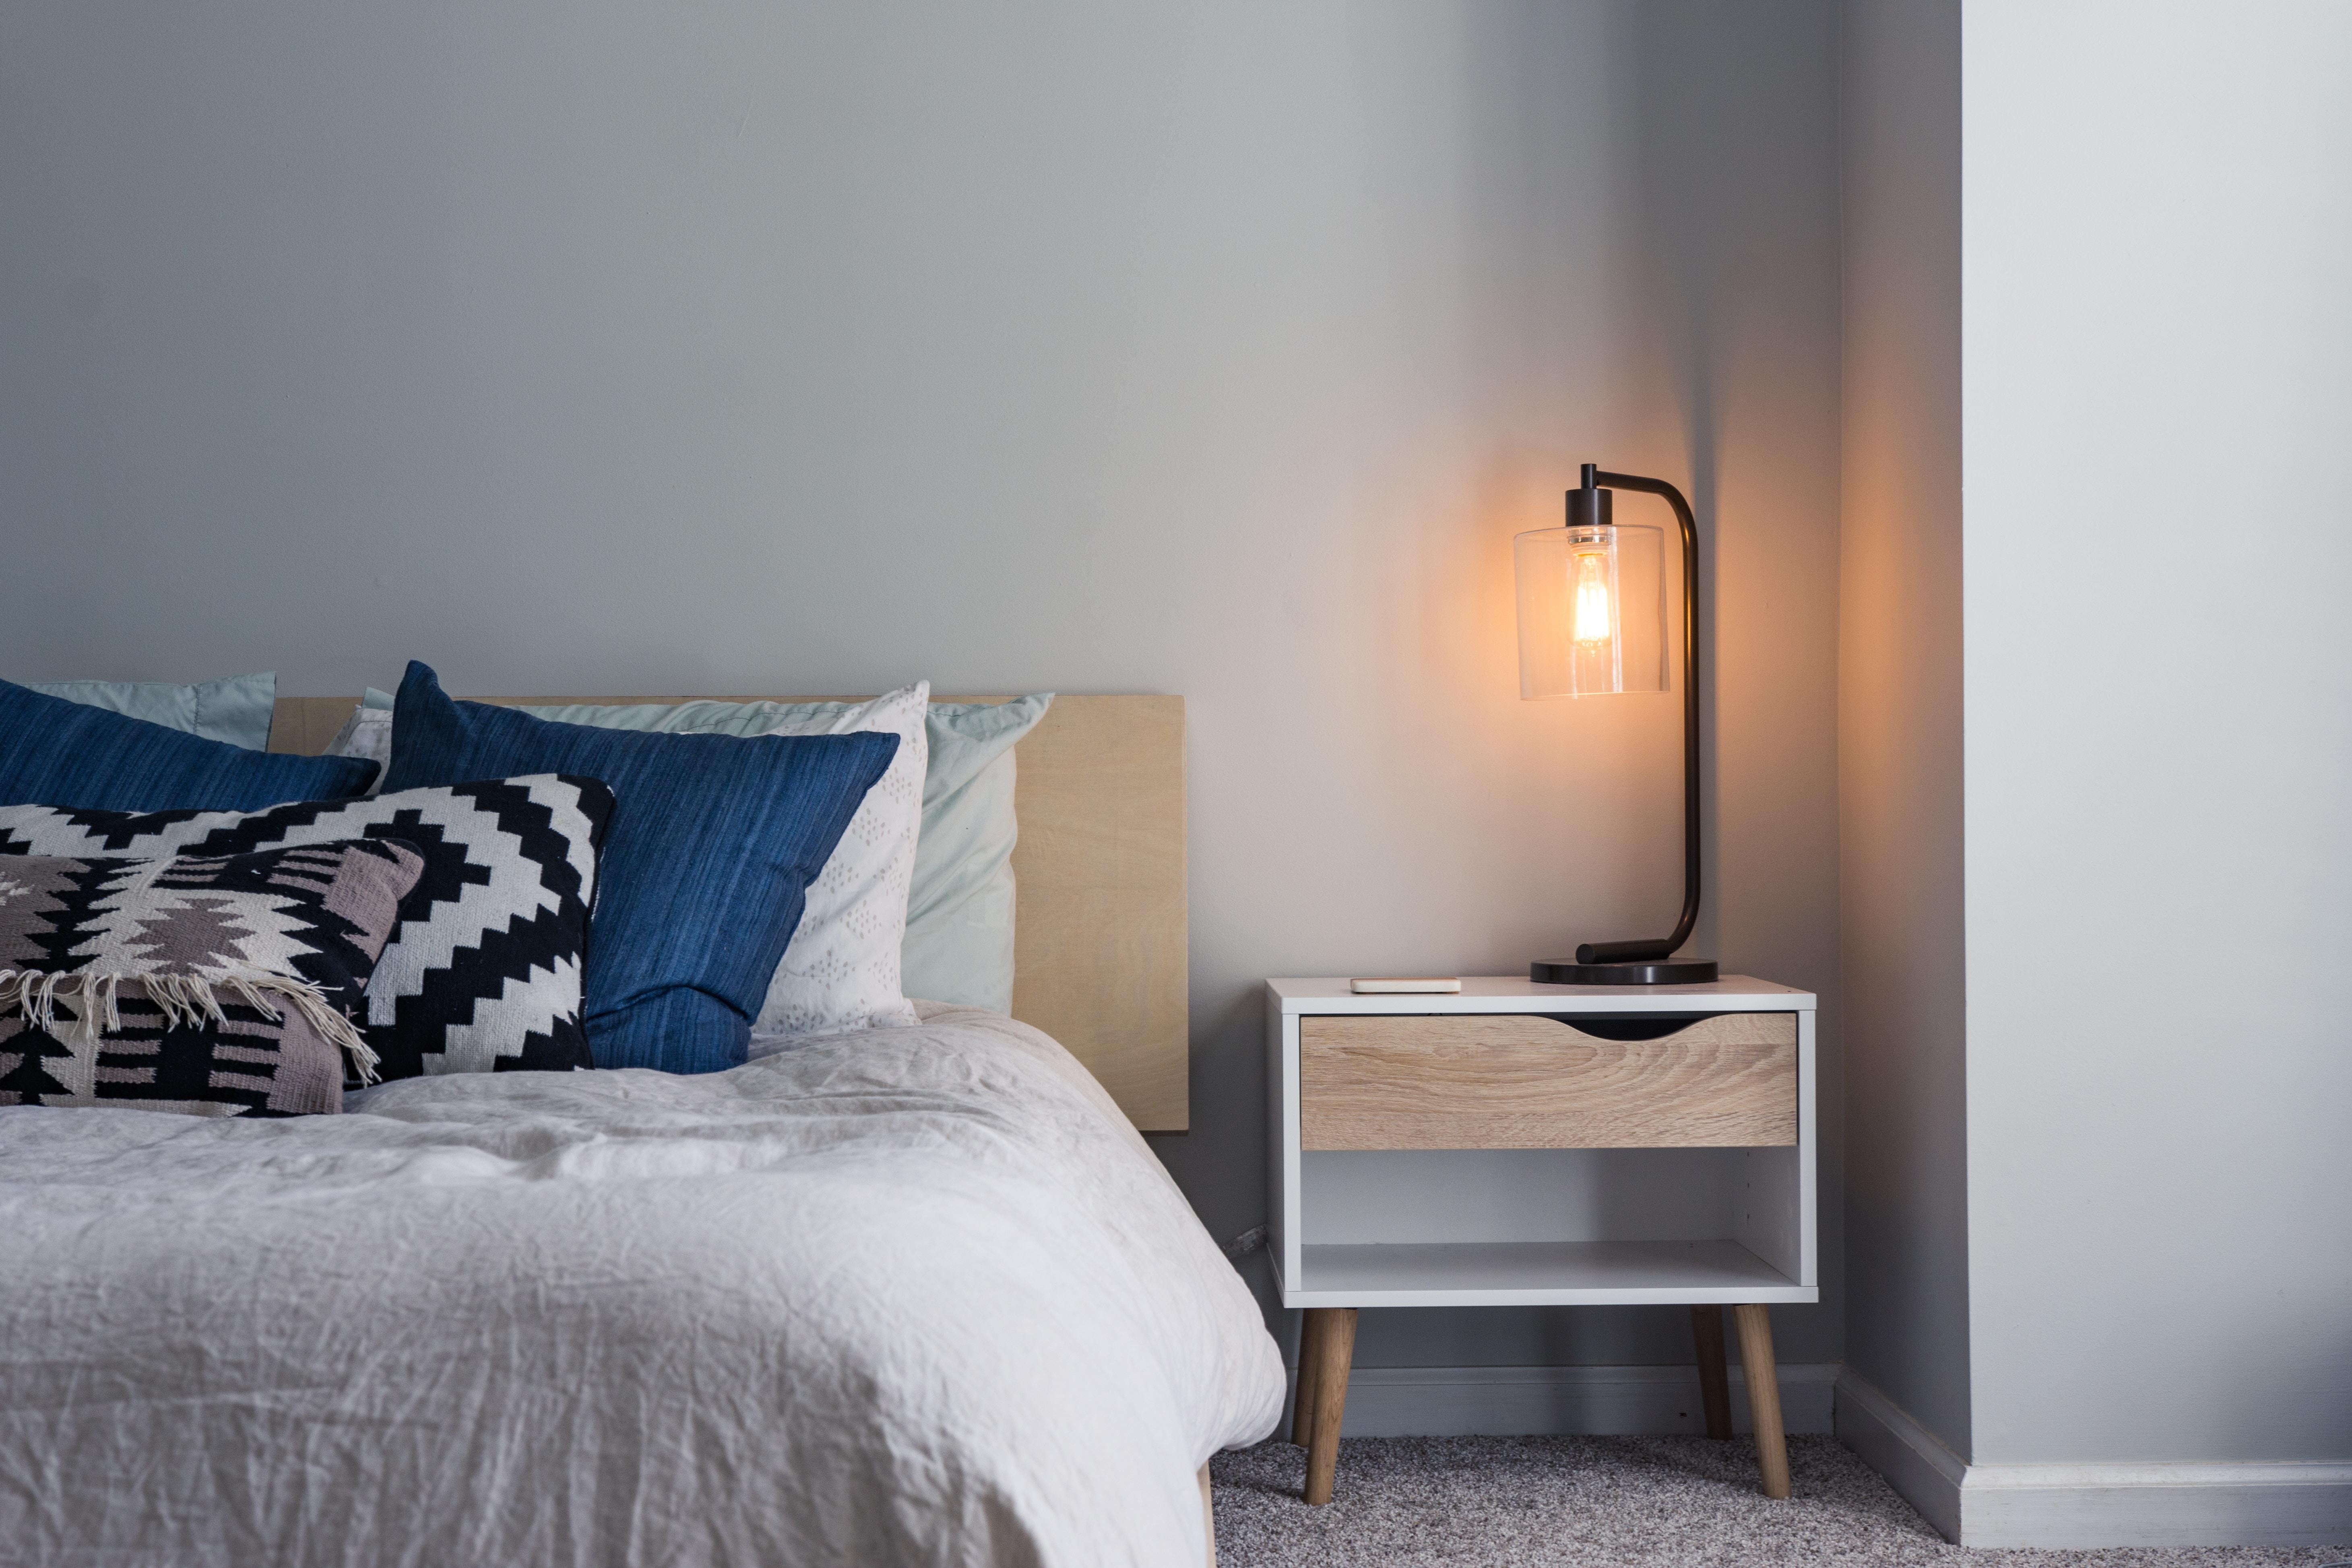 black table lamp on nightstand